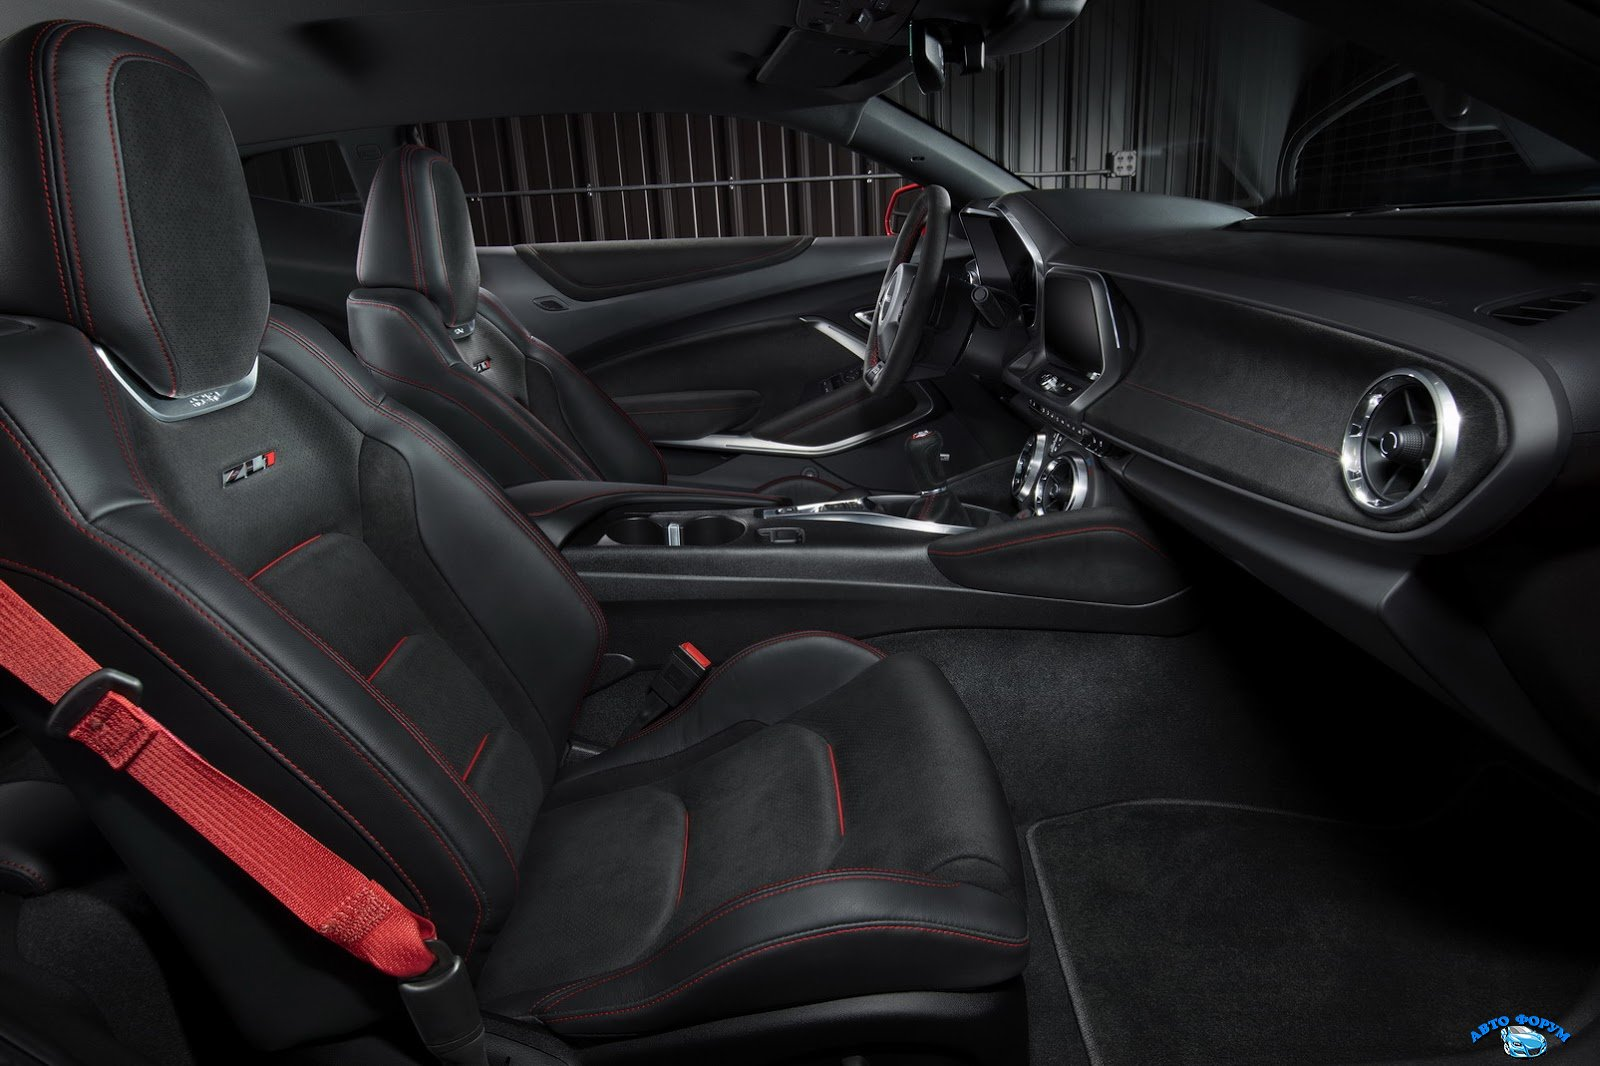 2017-Chevrolet-Camaro-ZL1-8.jpg